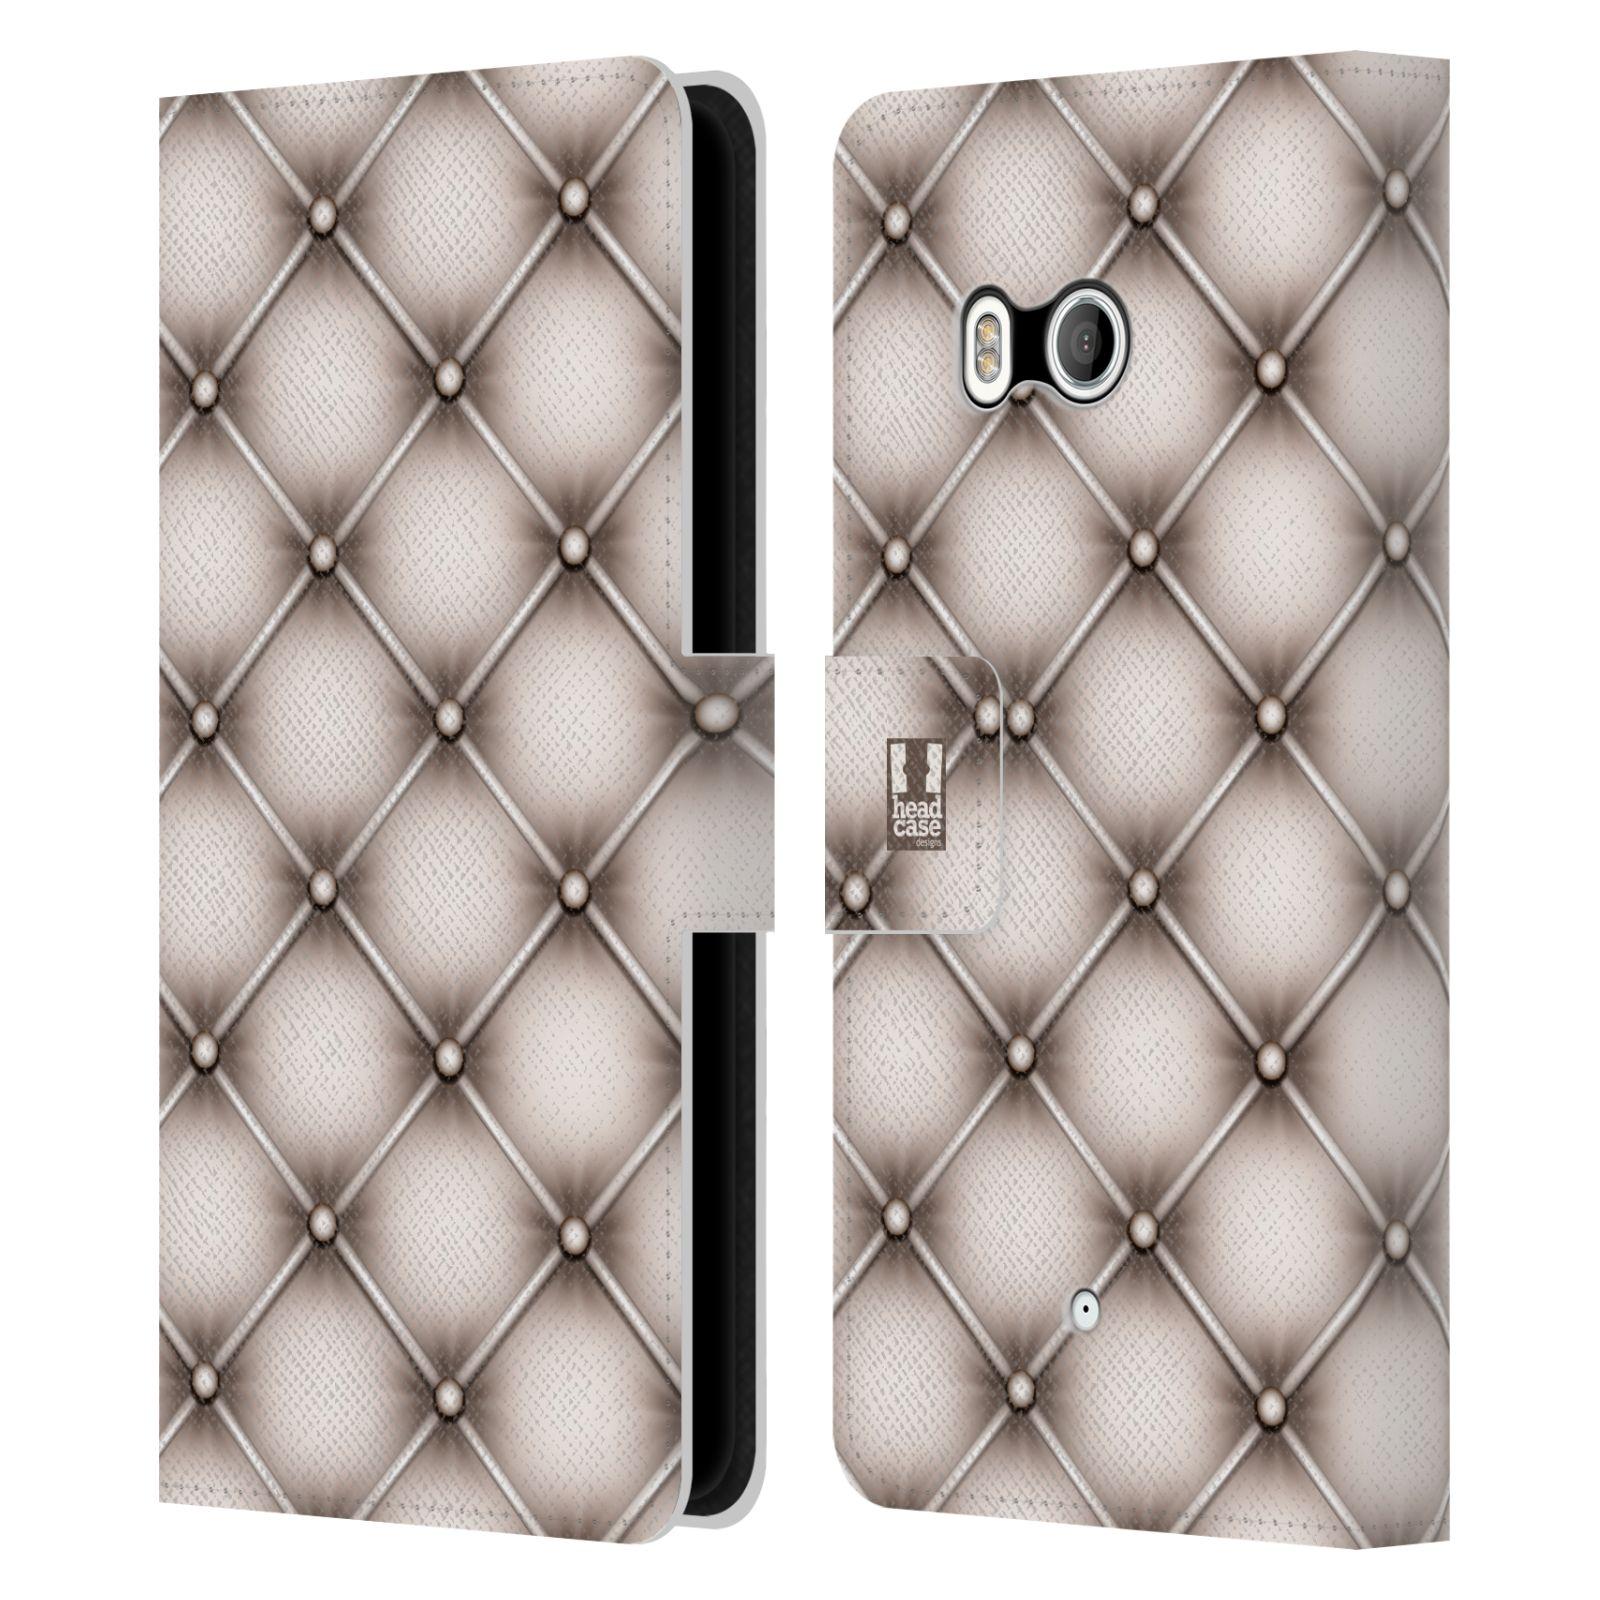 head case designs kissen brieftasche handyh lle aus leder f r htc u11 dual ebay. Black Bedroom Furniture Sets. Home Design Ideas